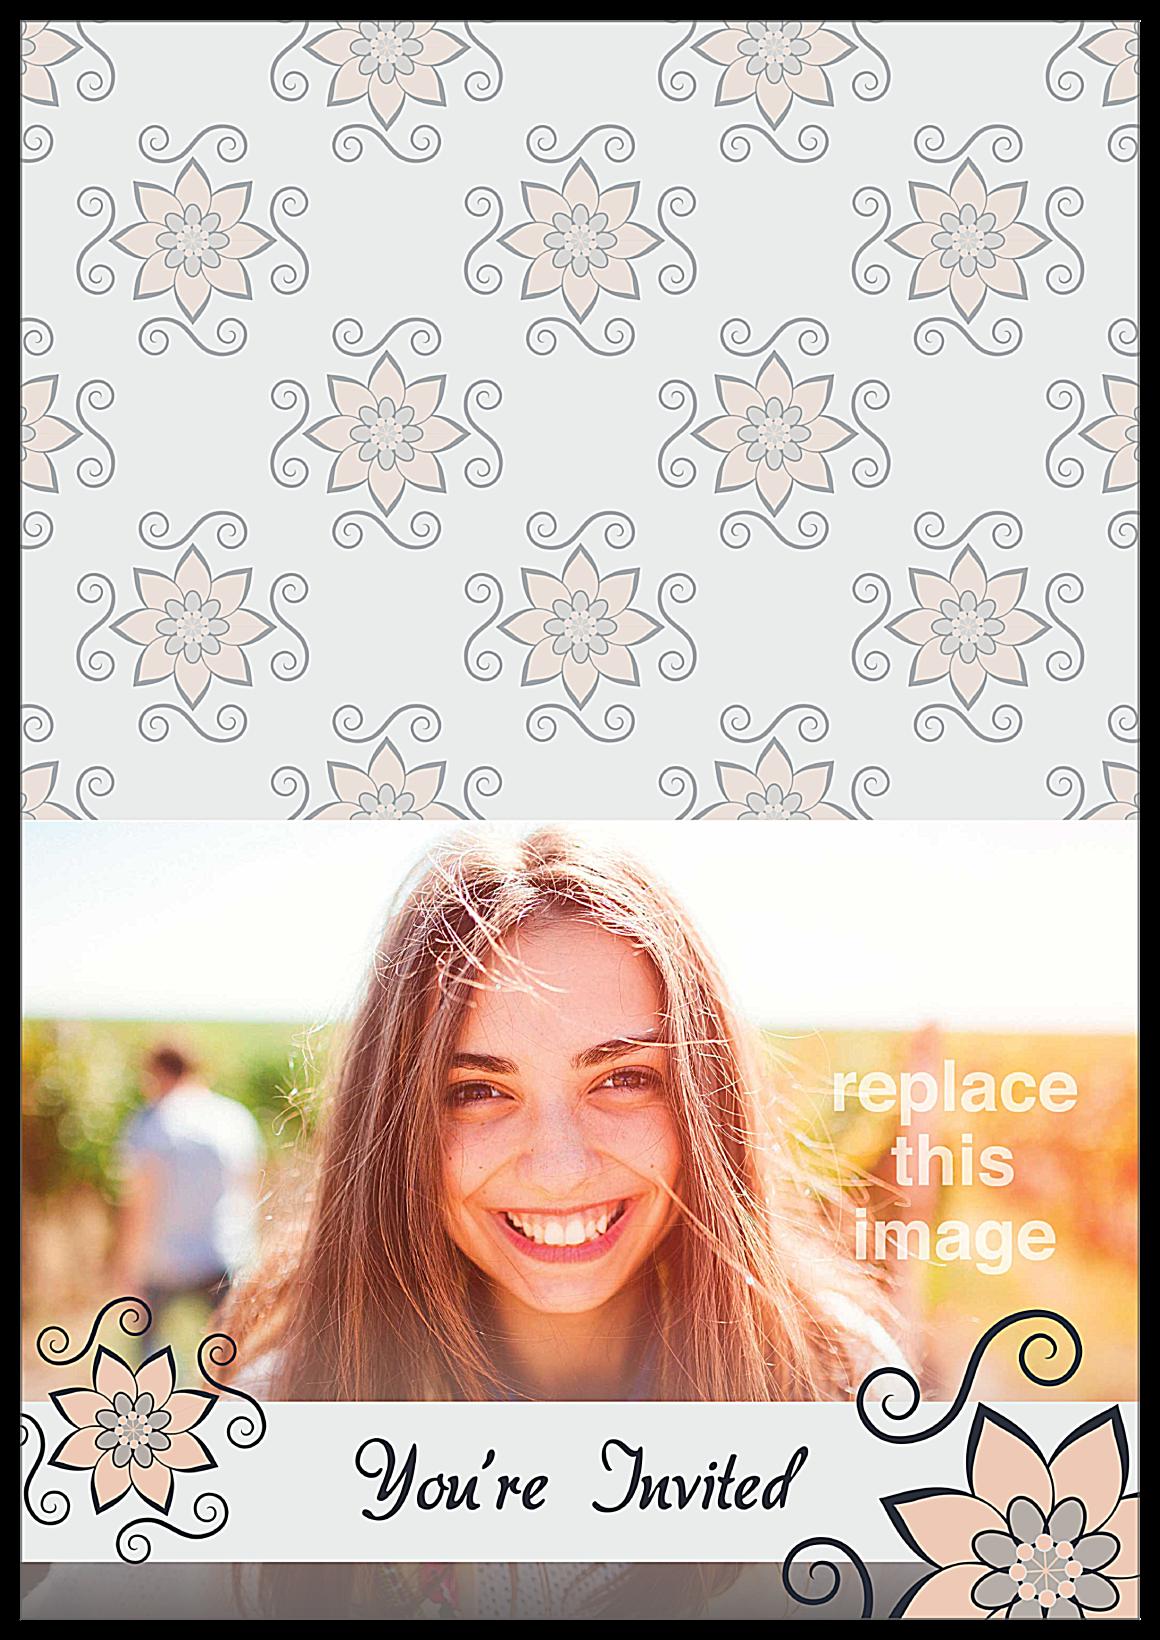 Flower Swirls front - Greeting Cards Maker